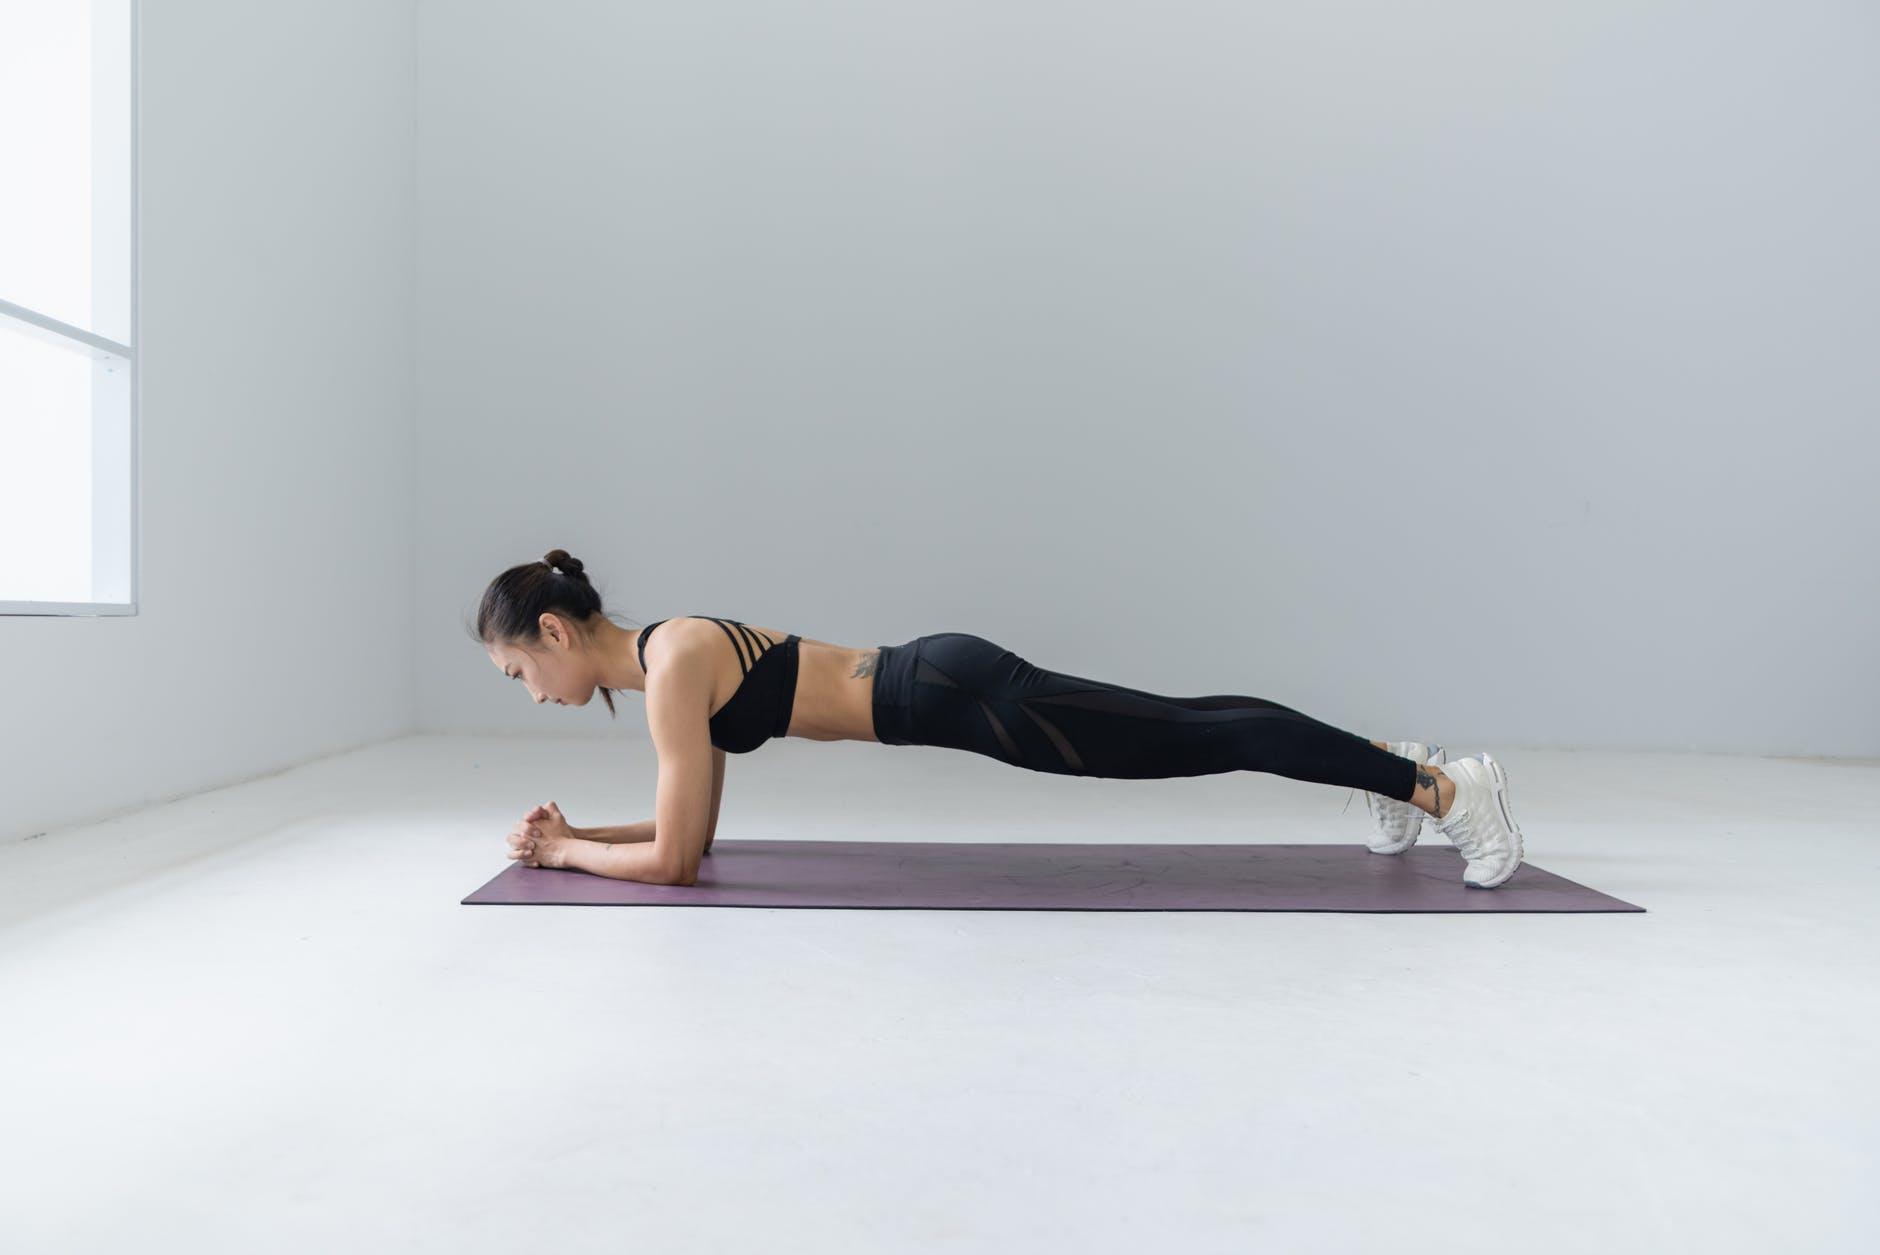 Качественная йога практика